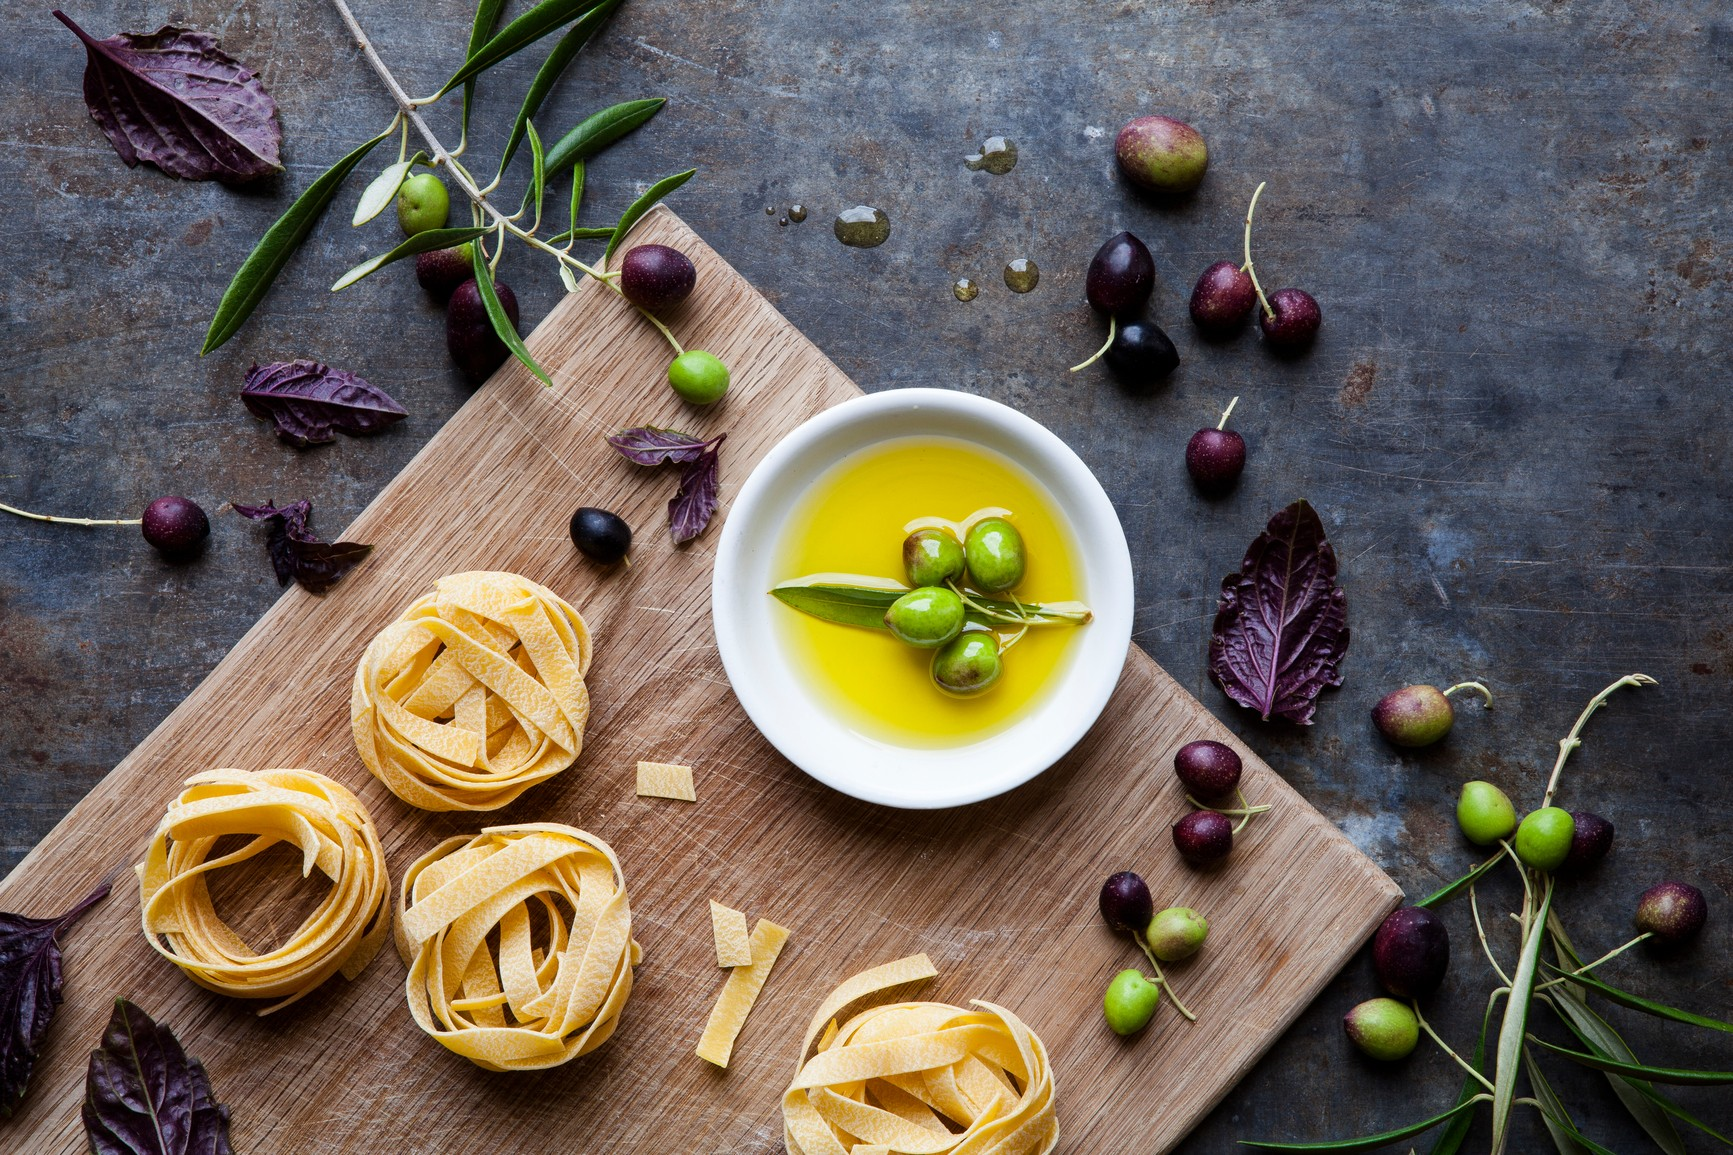 O oliwie